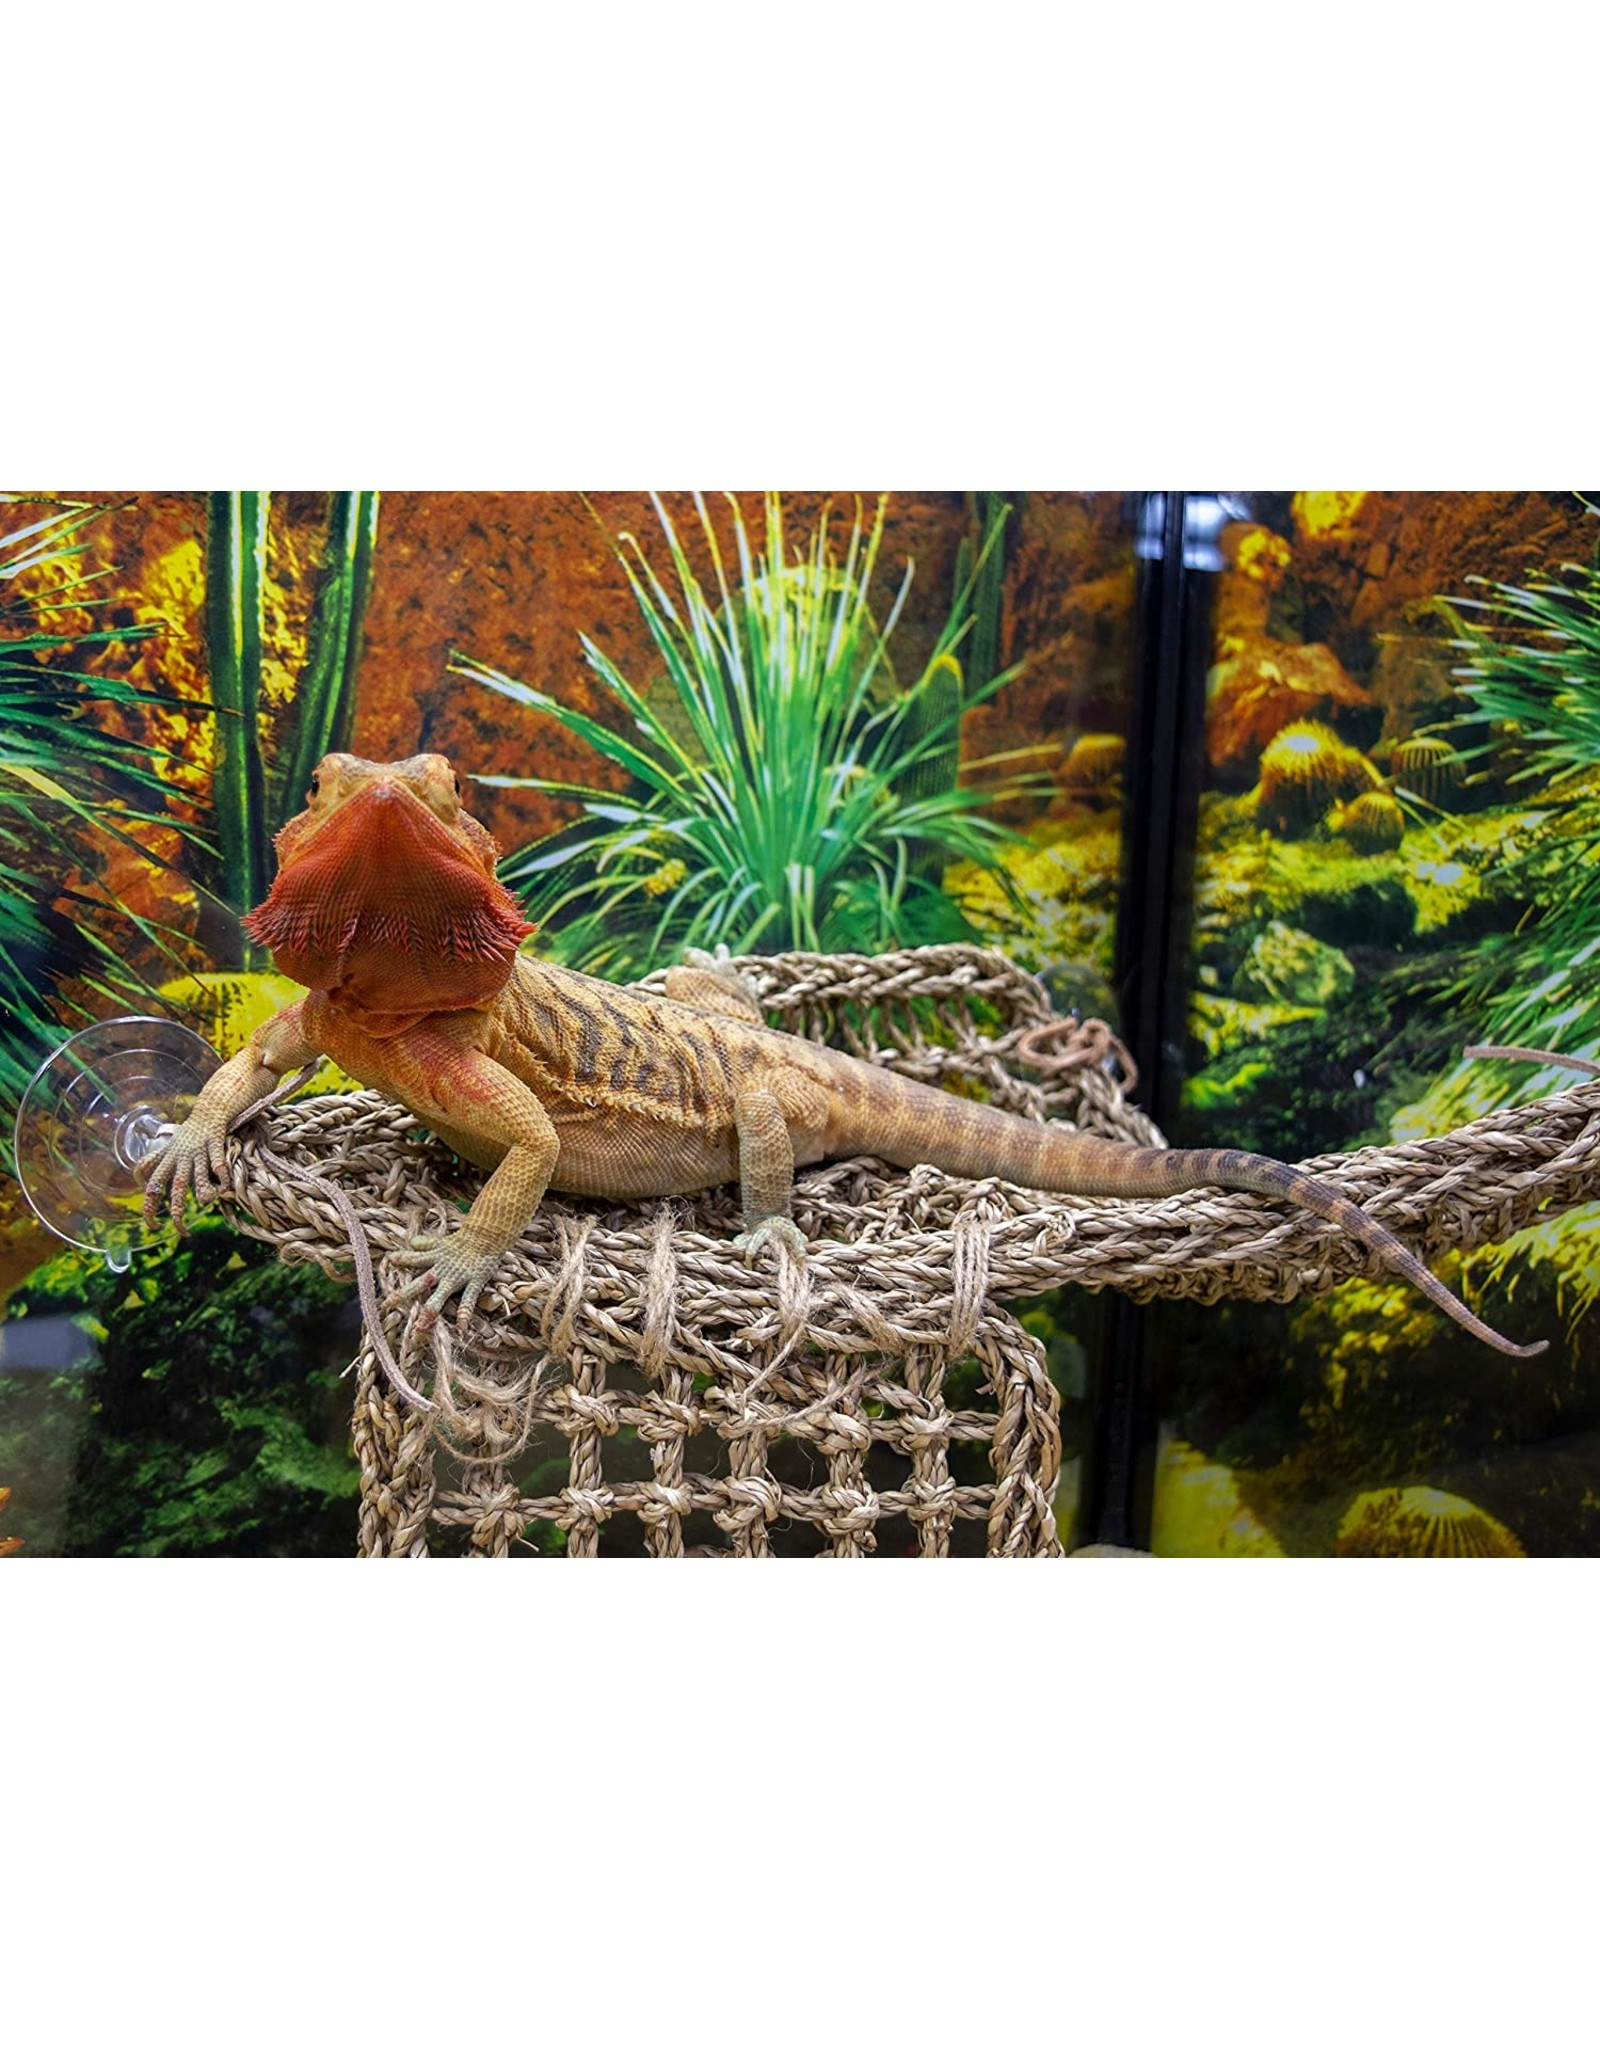 Penn Plax PENN PLAX Natural Lizard Lounger Hammock Corner